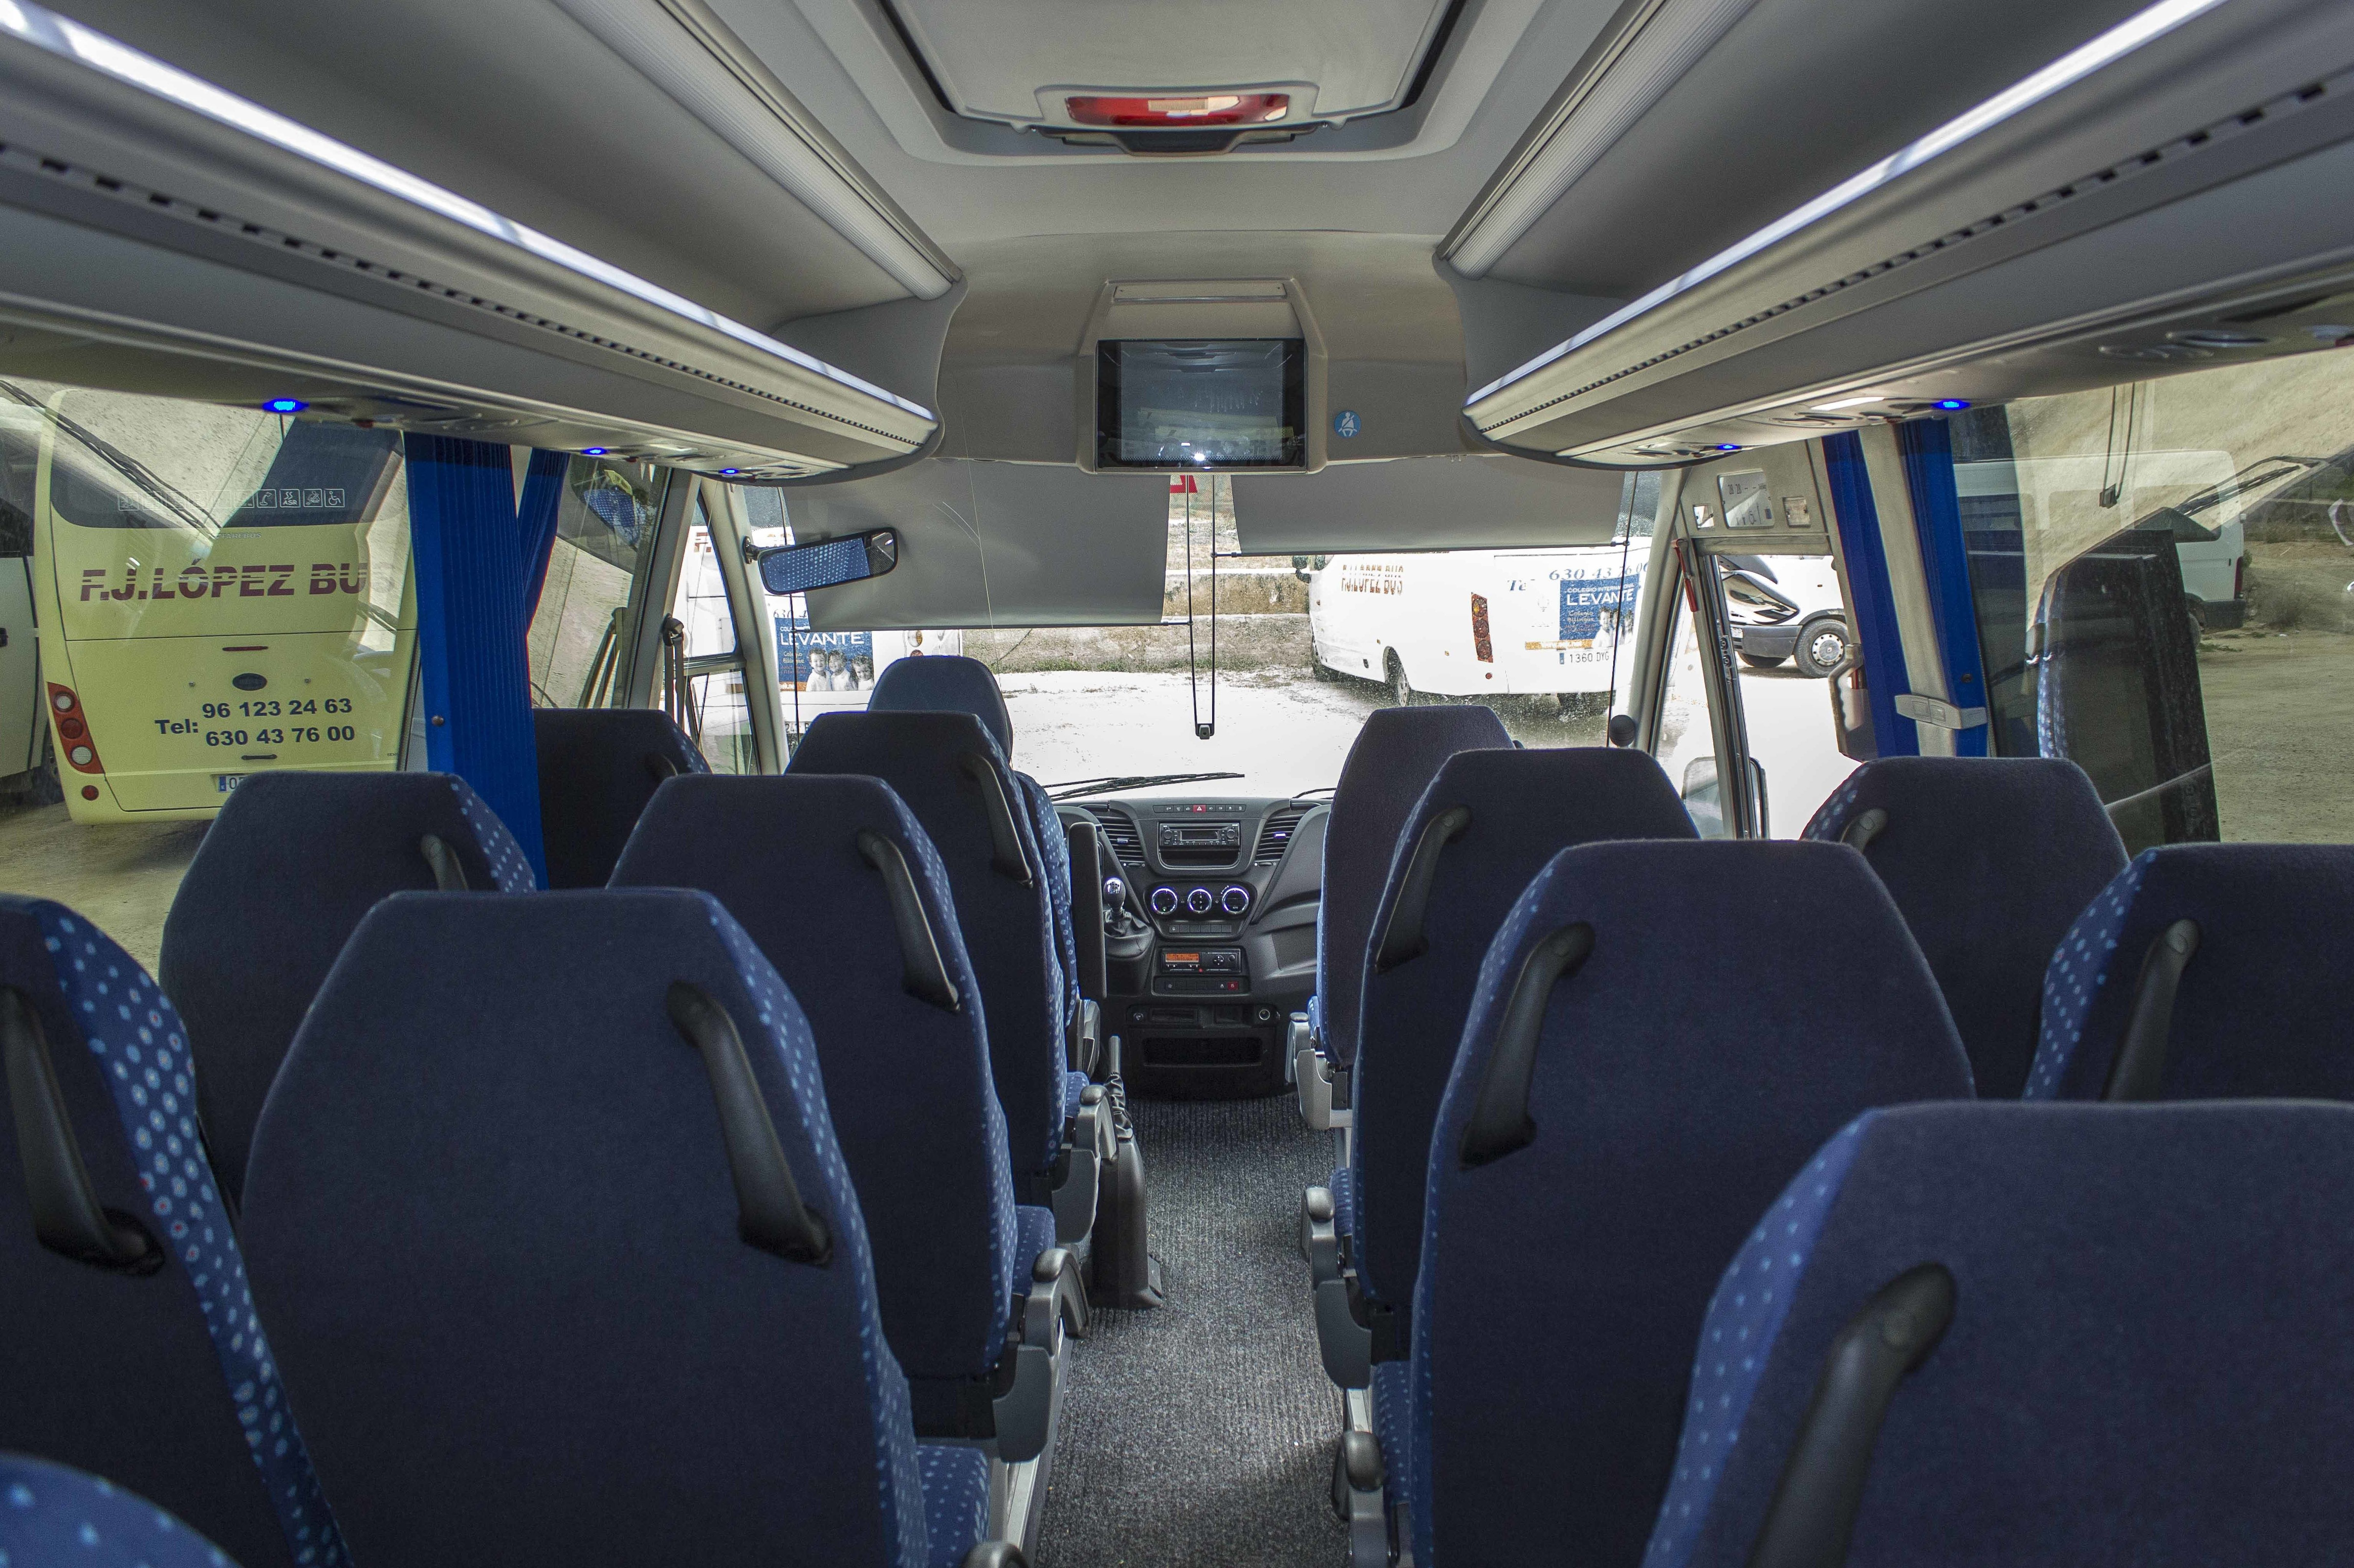 Autobuses baratos Valencia